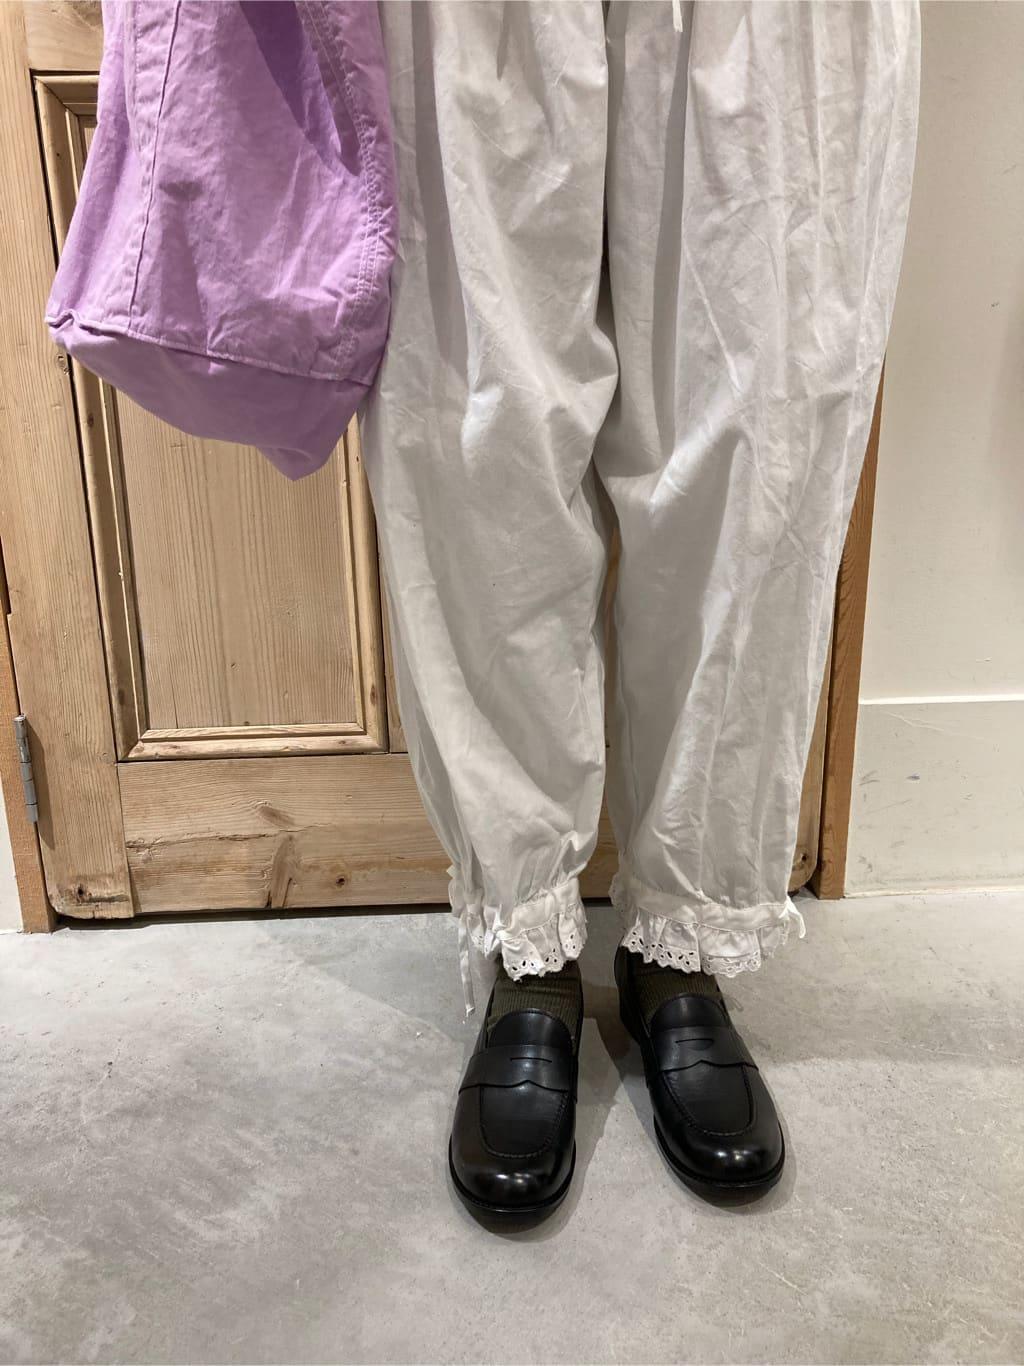 Malle chambre de charme 調布パルコ 身長:162cm 2021.09.16